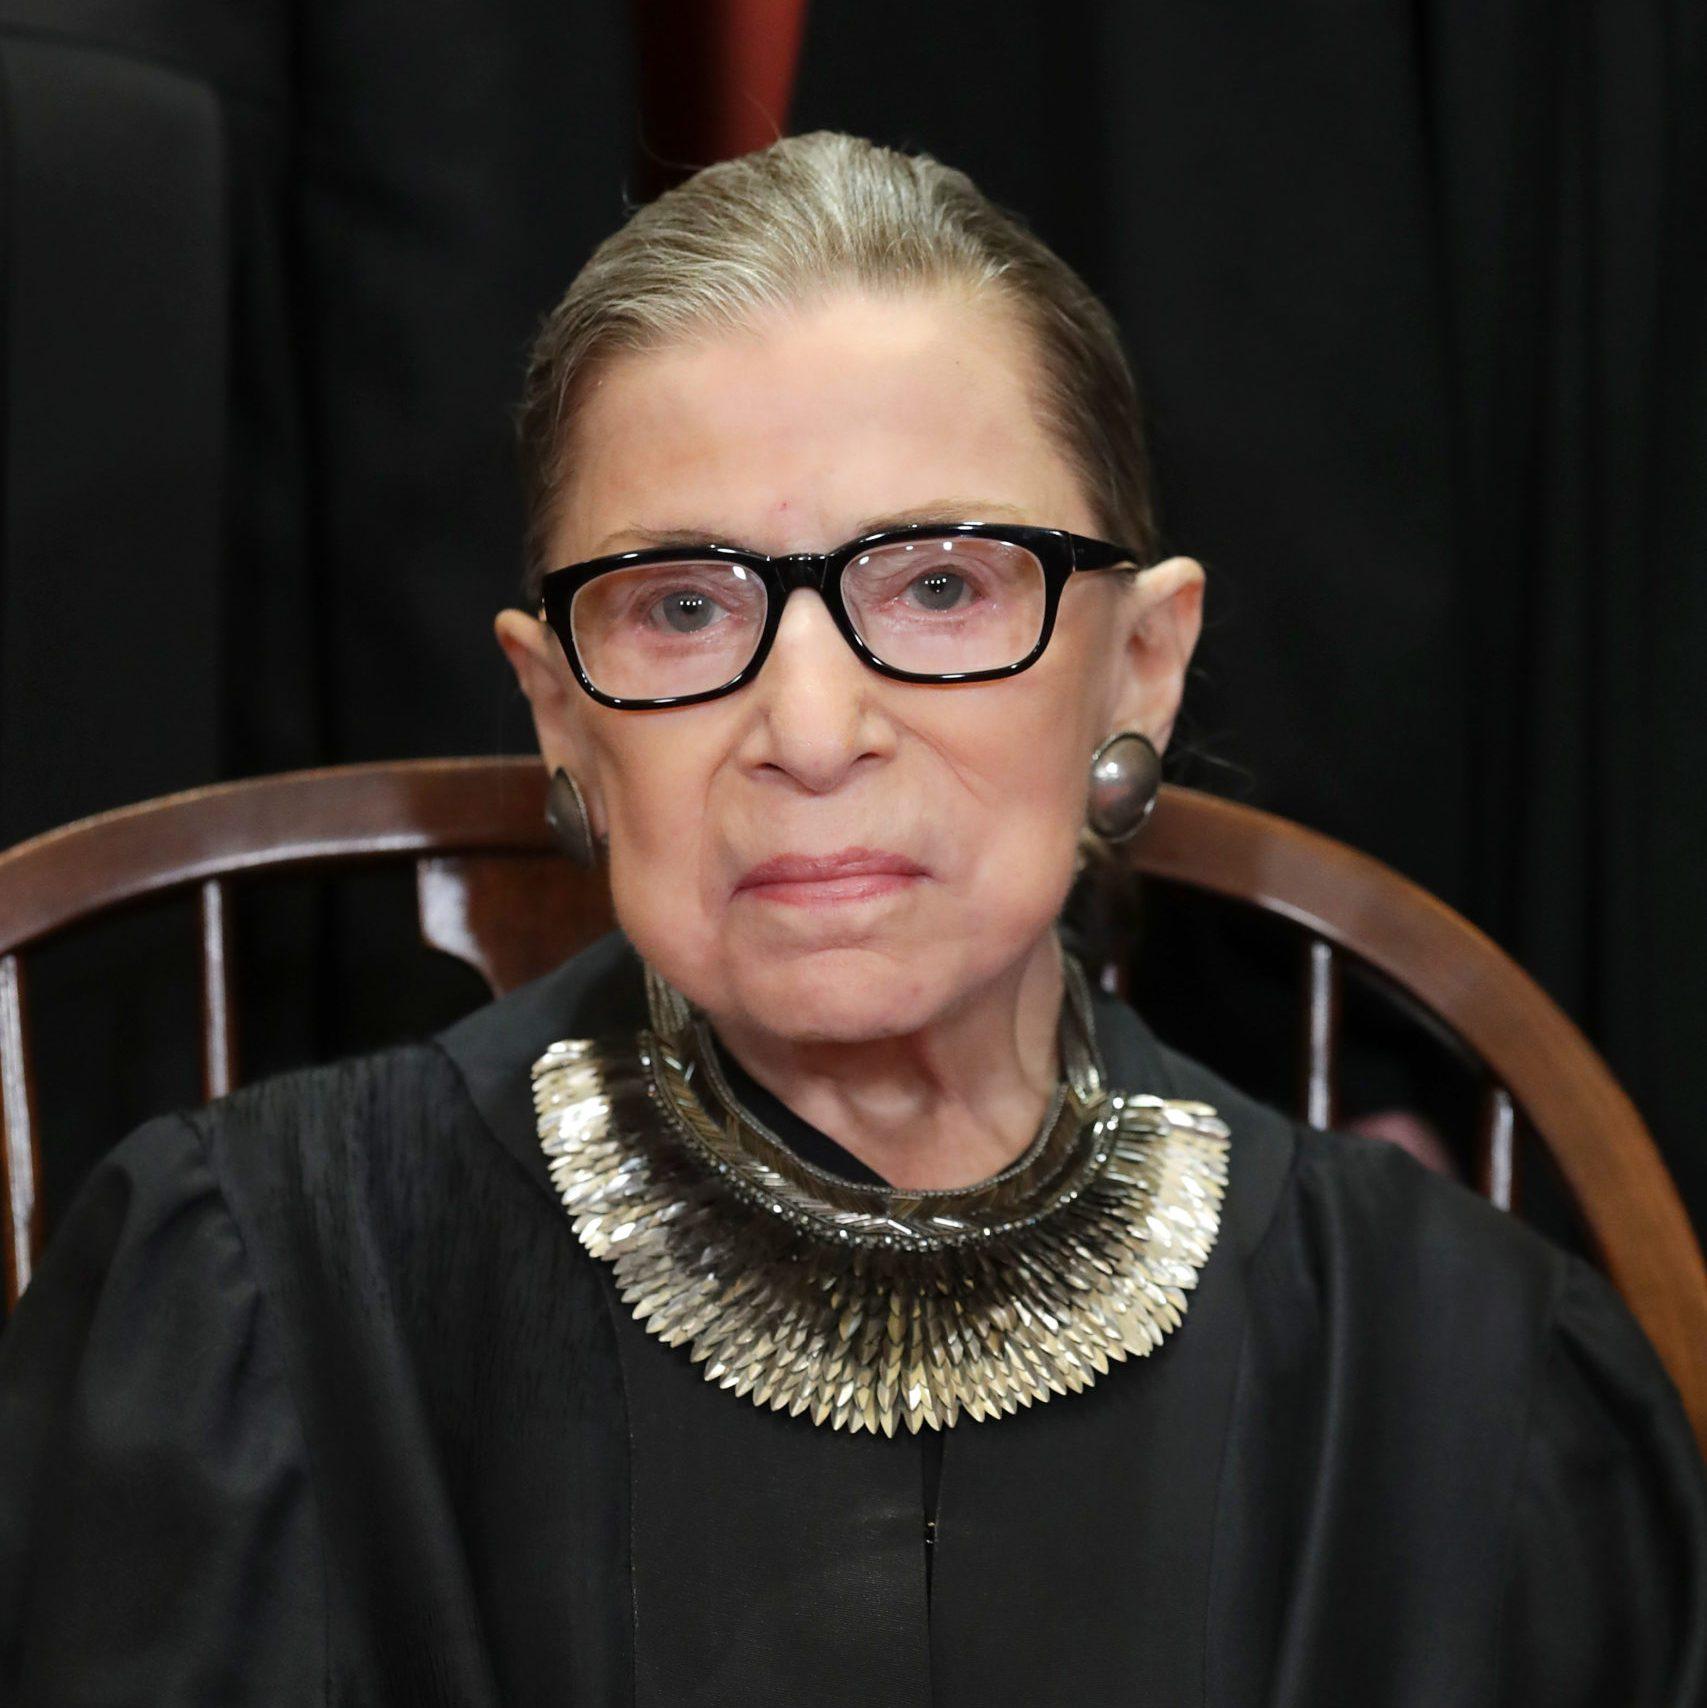 U.S. Supreme Court Justices Pose For Official Group Portrait